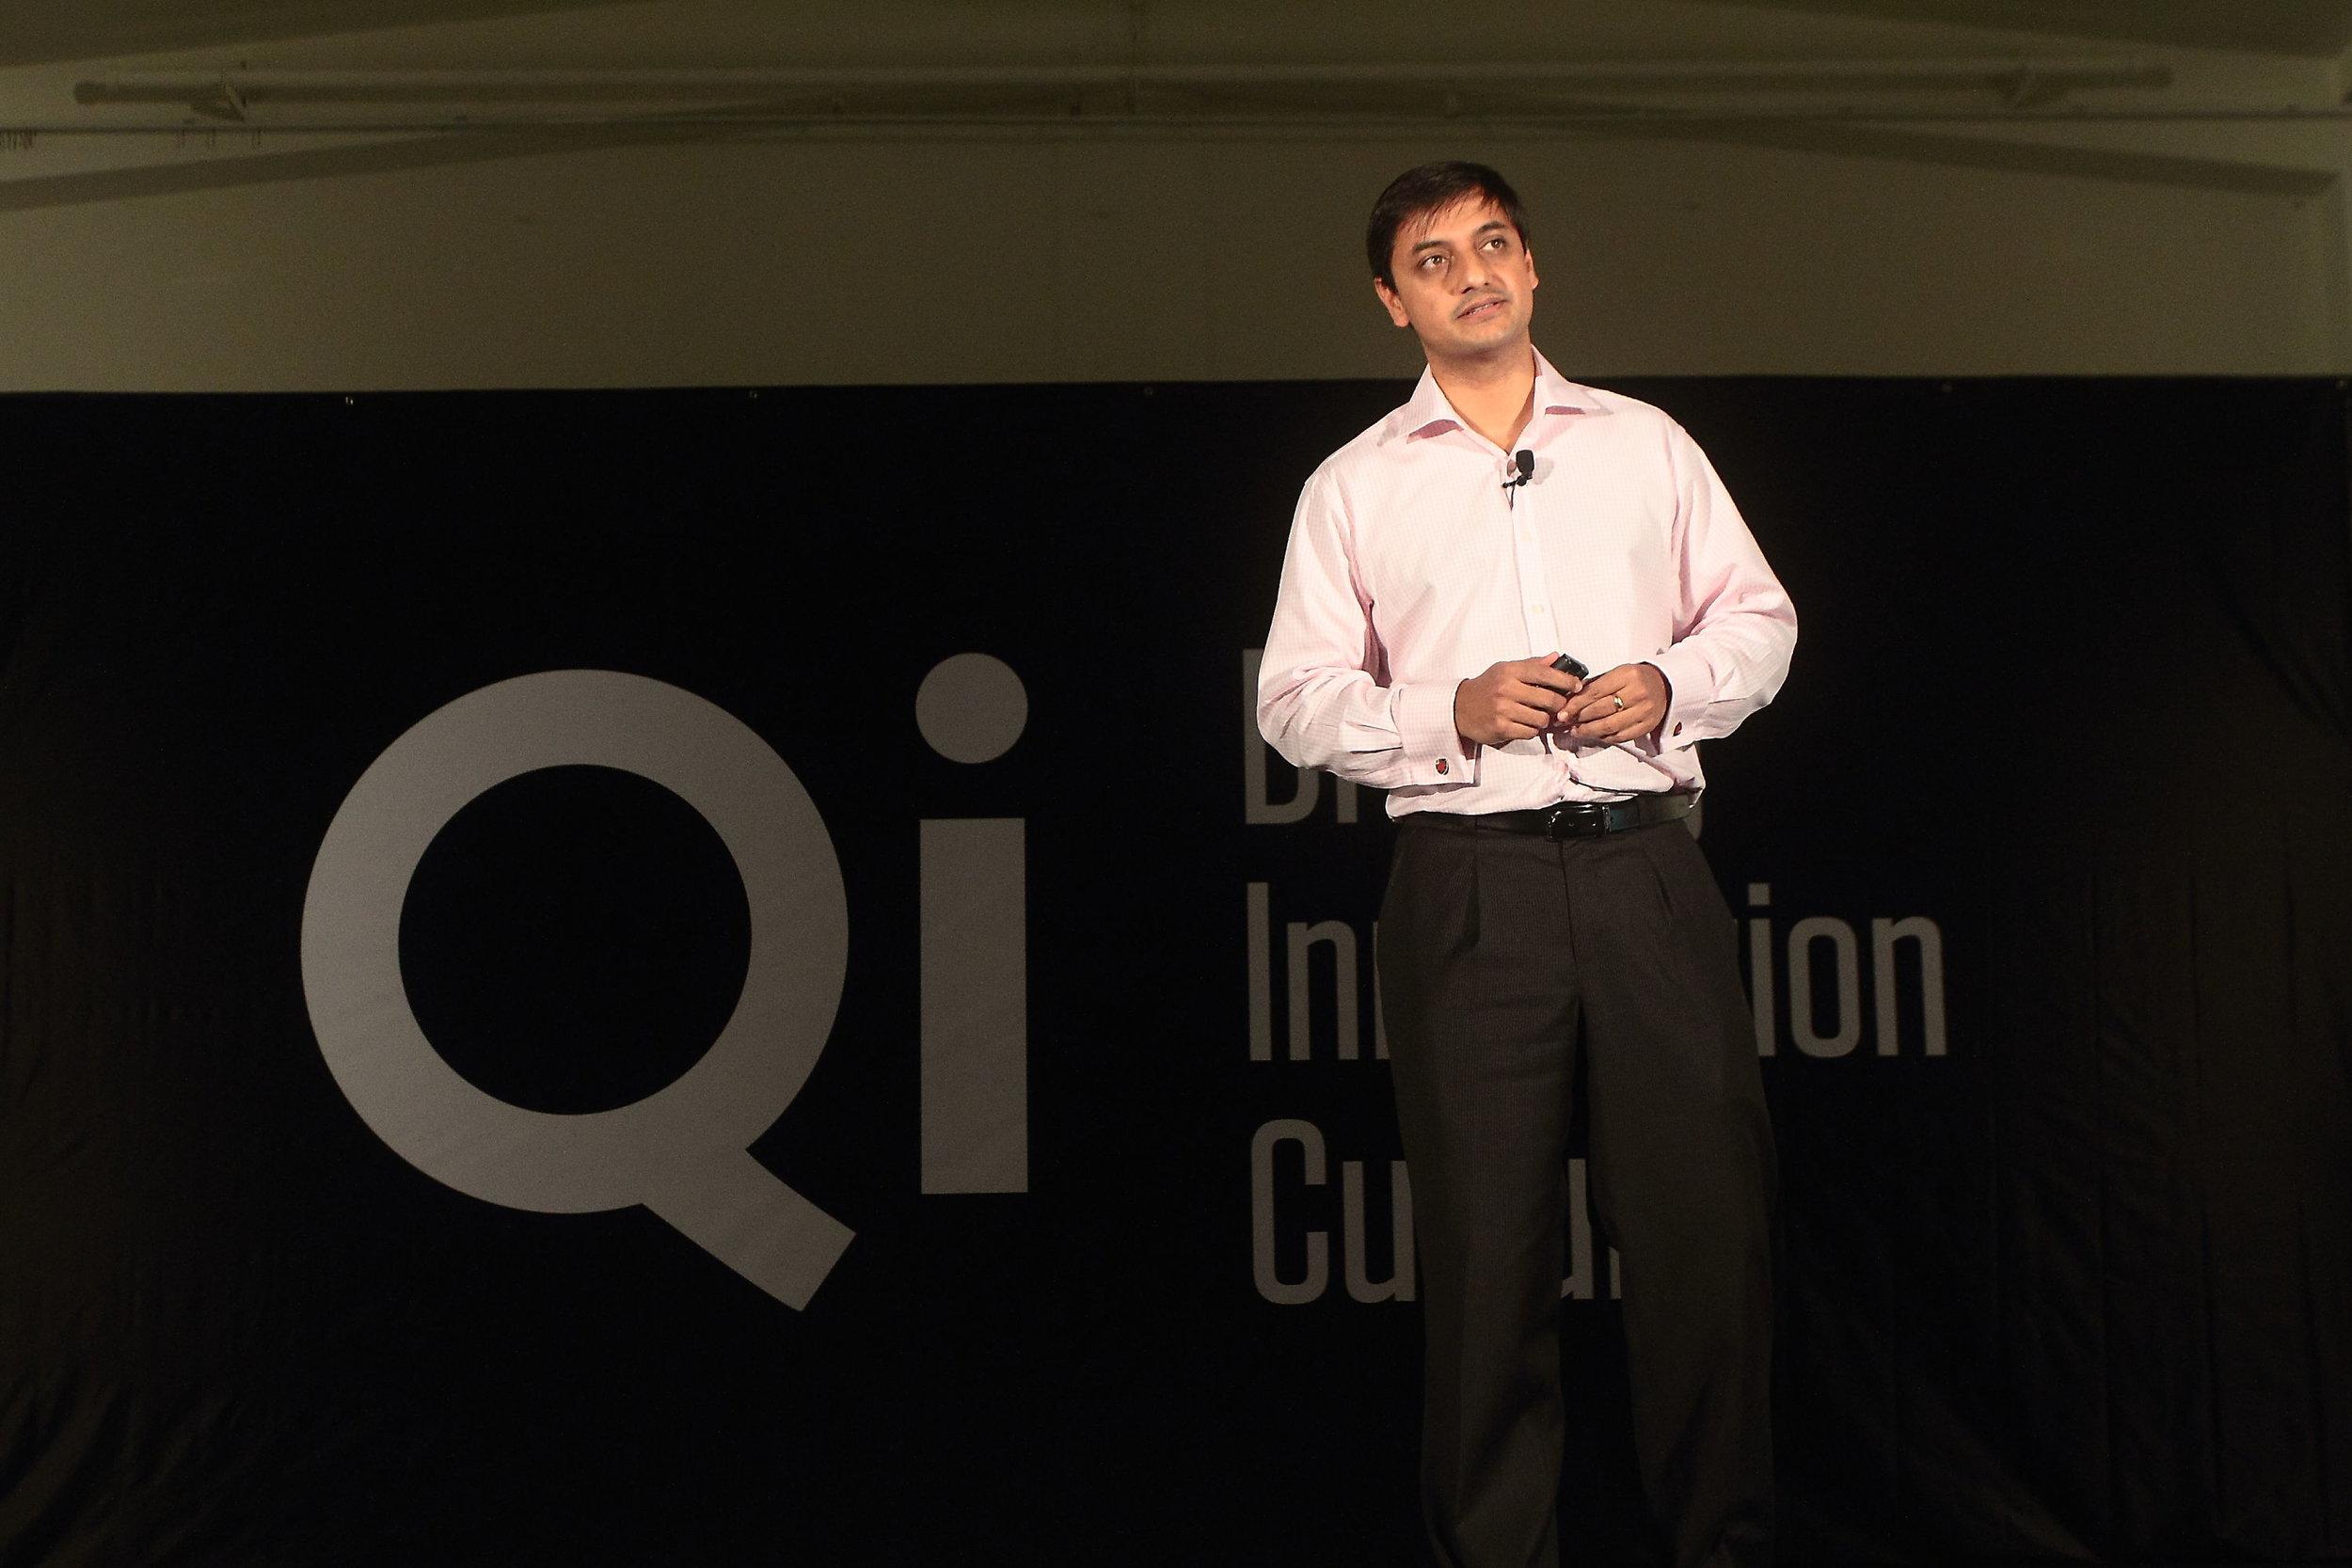 qi-global-2011-driving-innovation-culture-085.jpg